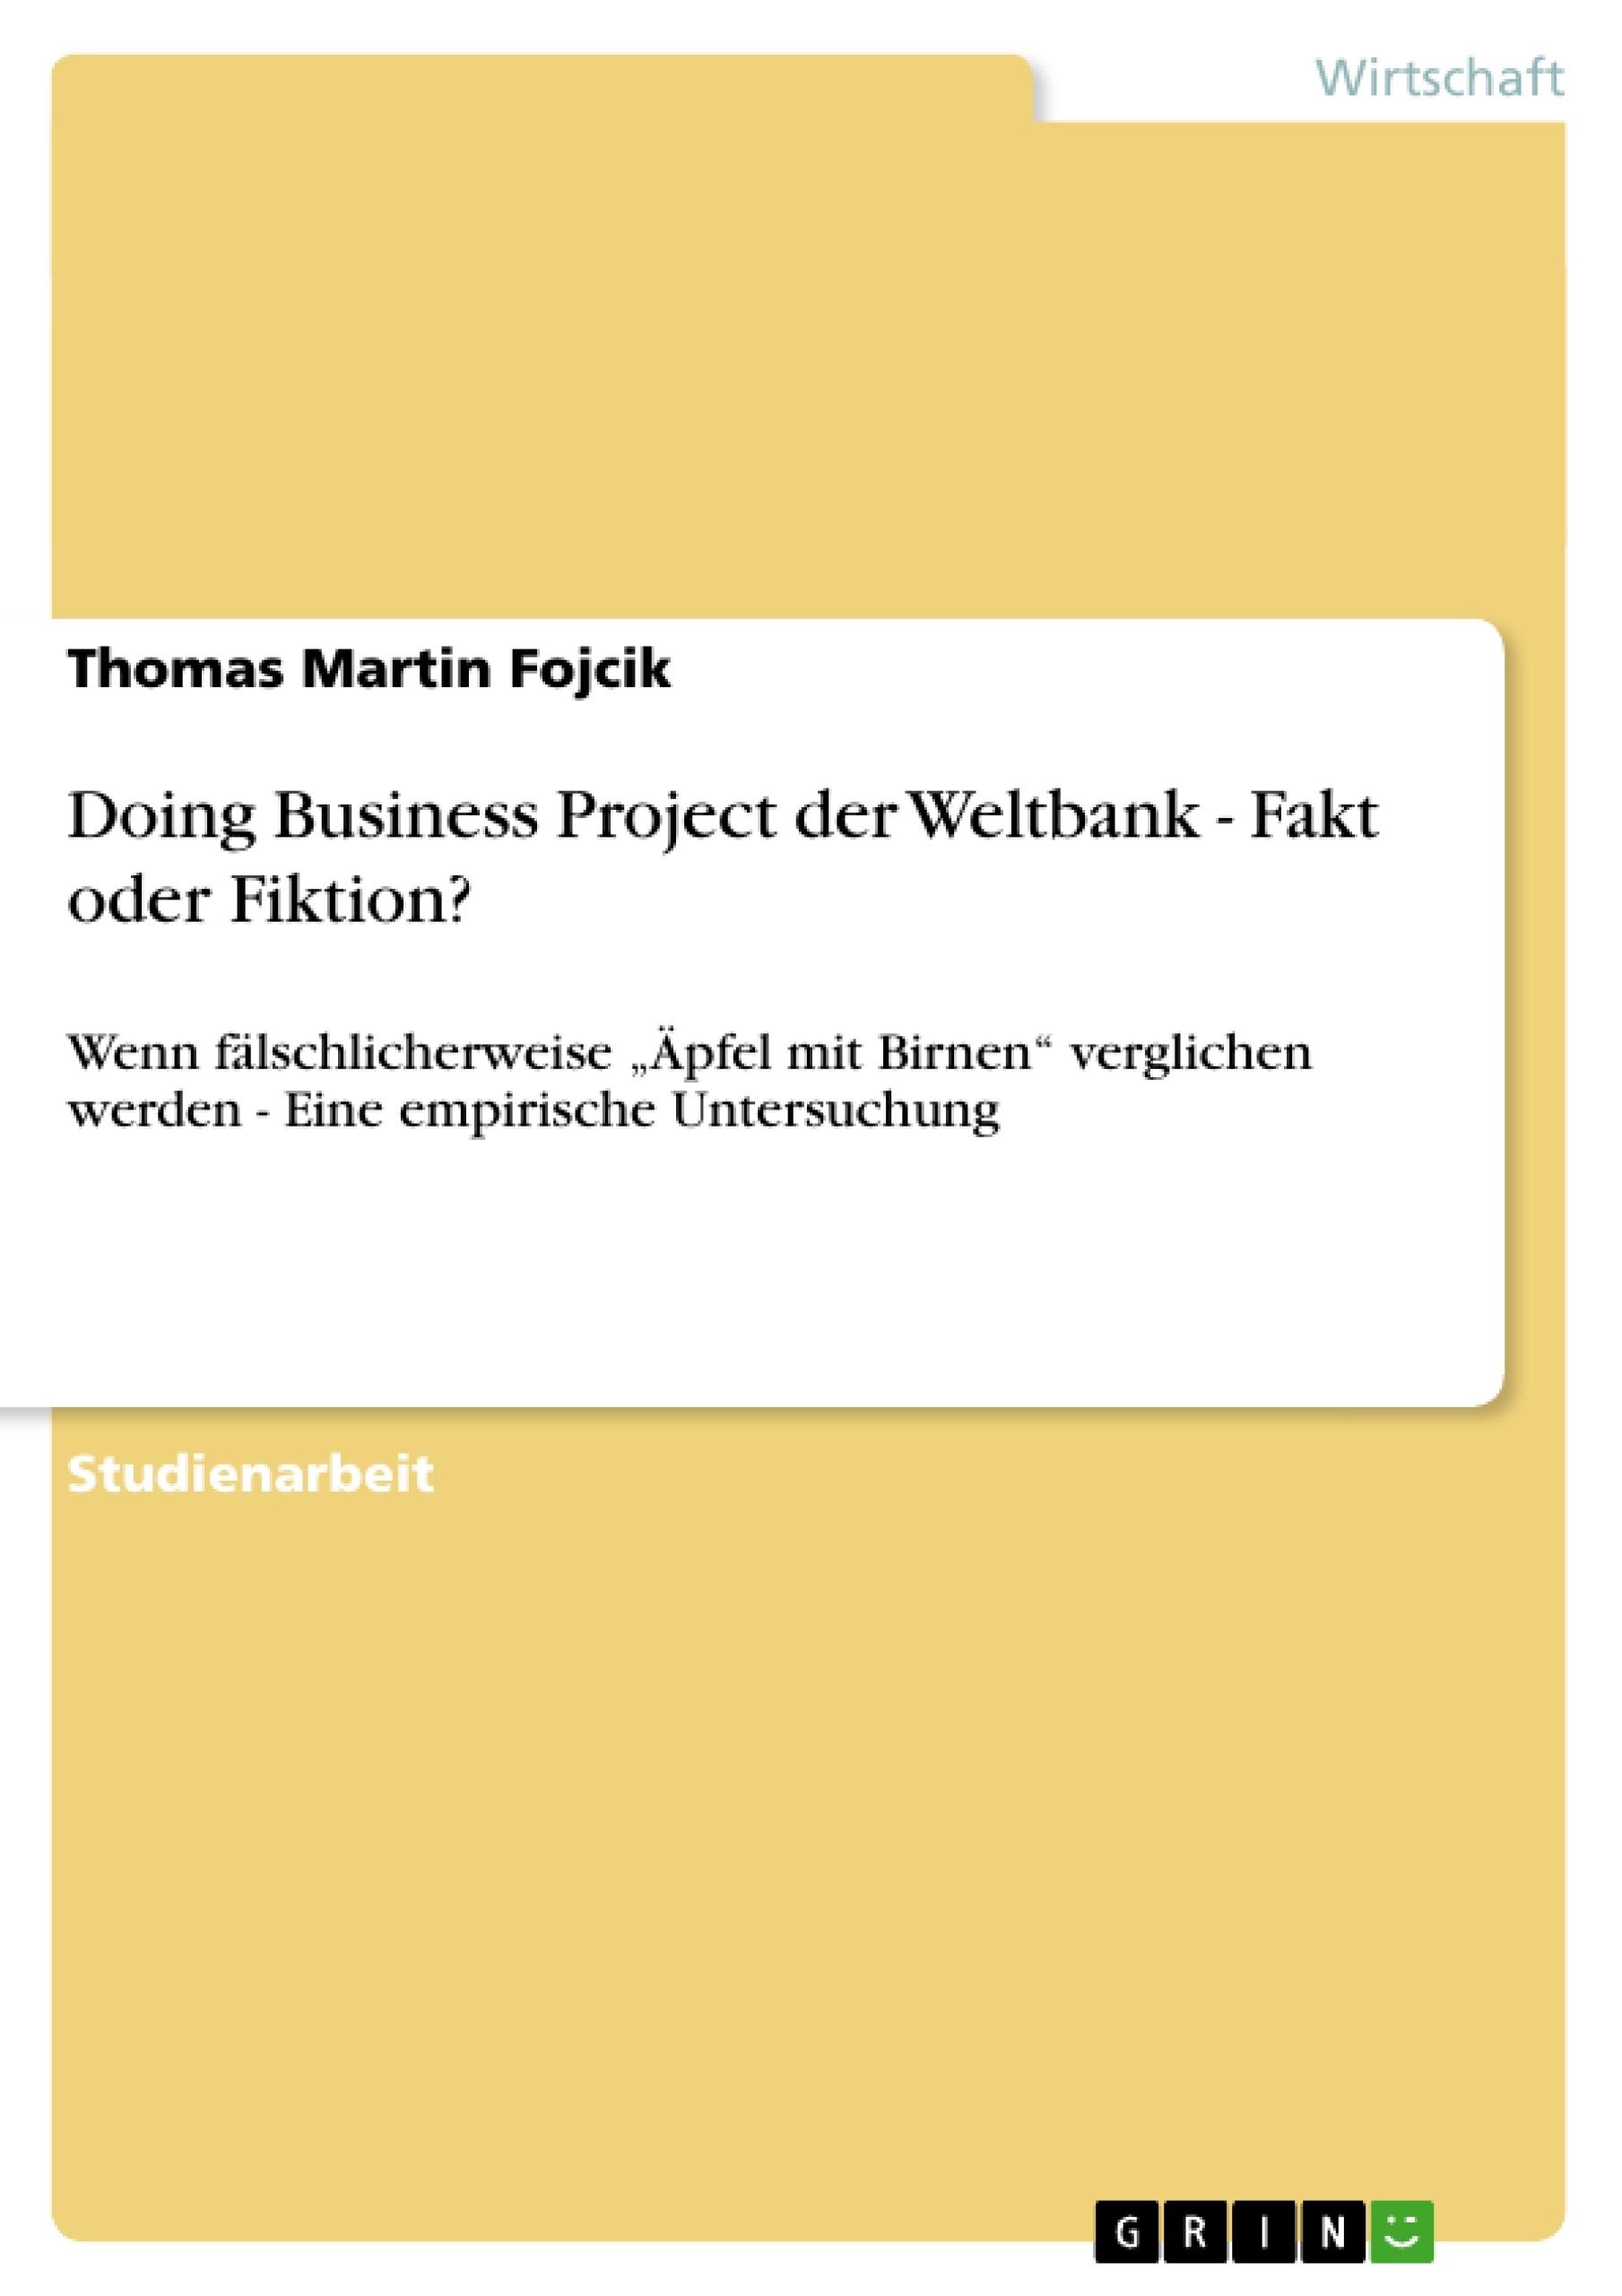 Titel: Doing Business Project der Weltbank - Fakt oder Fiktion?